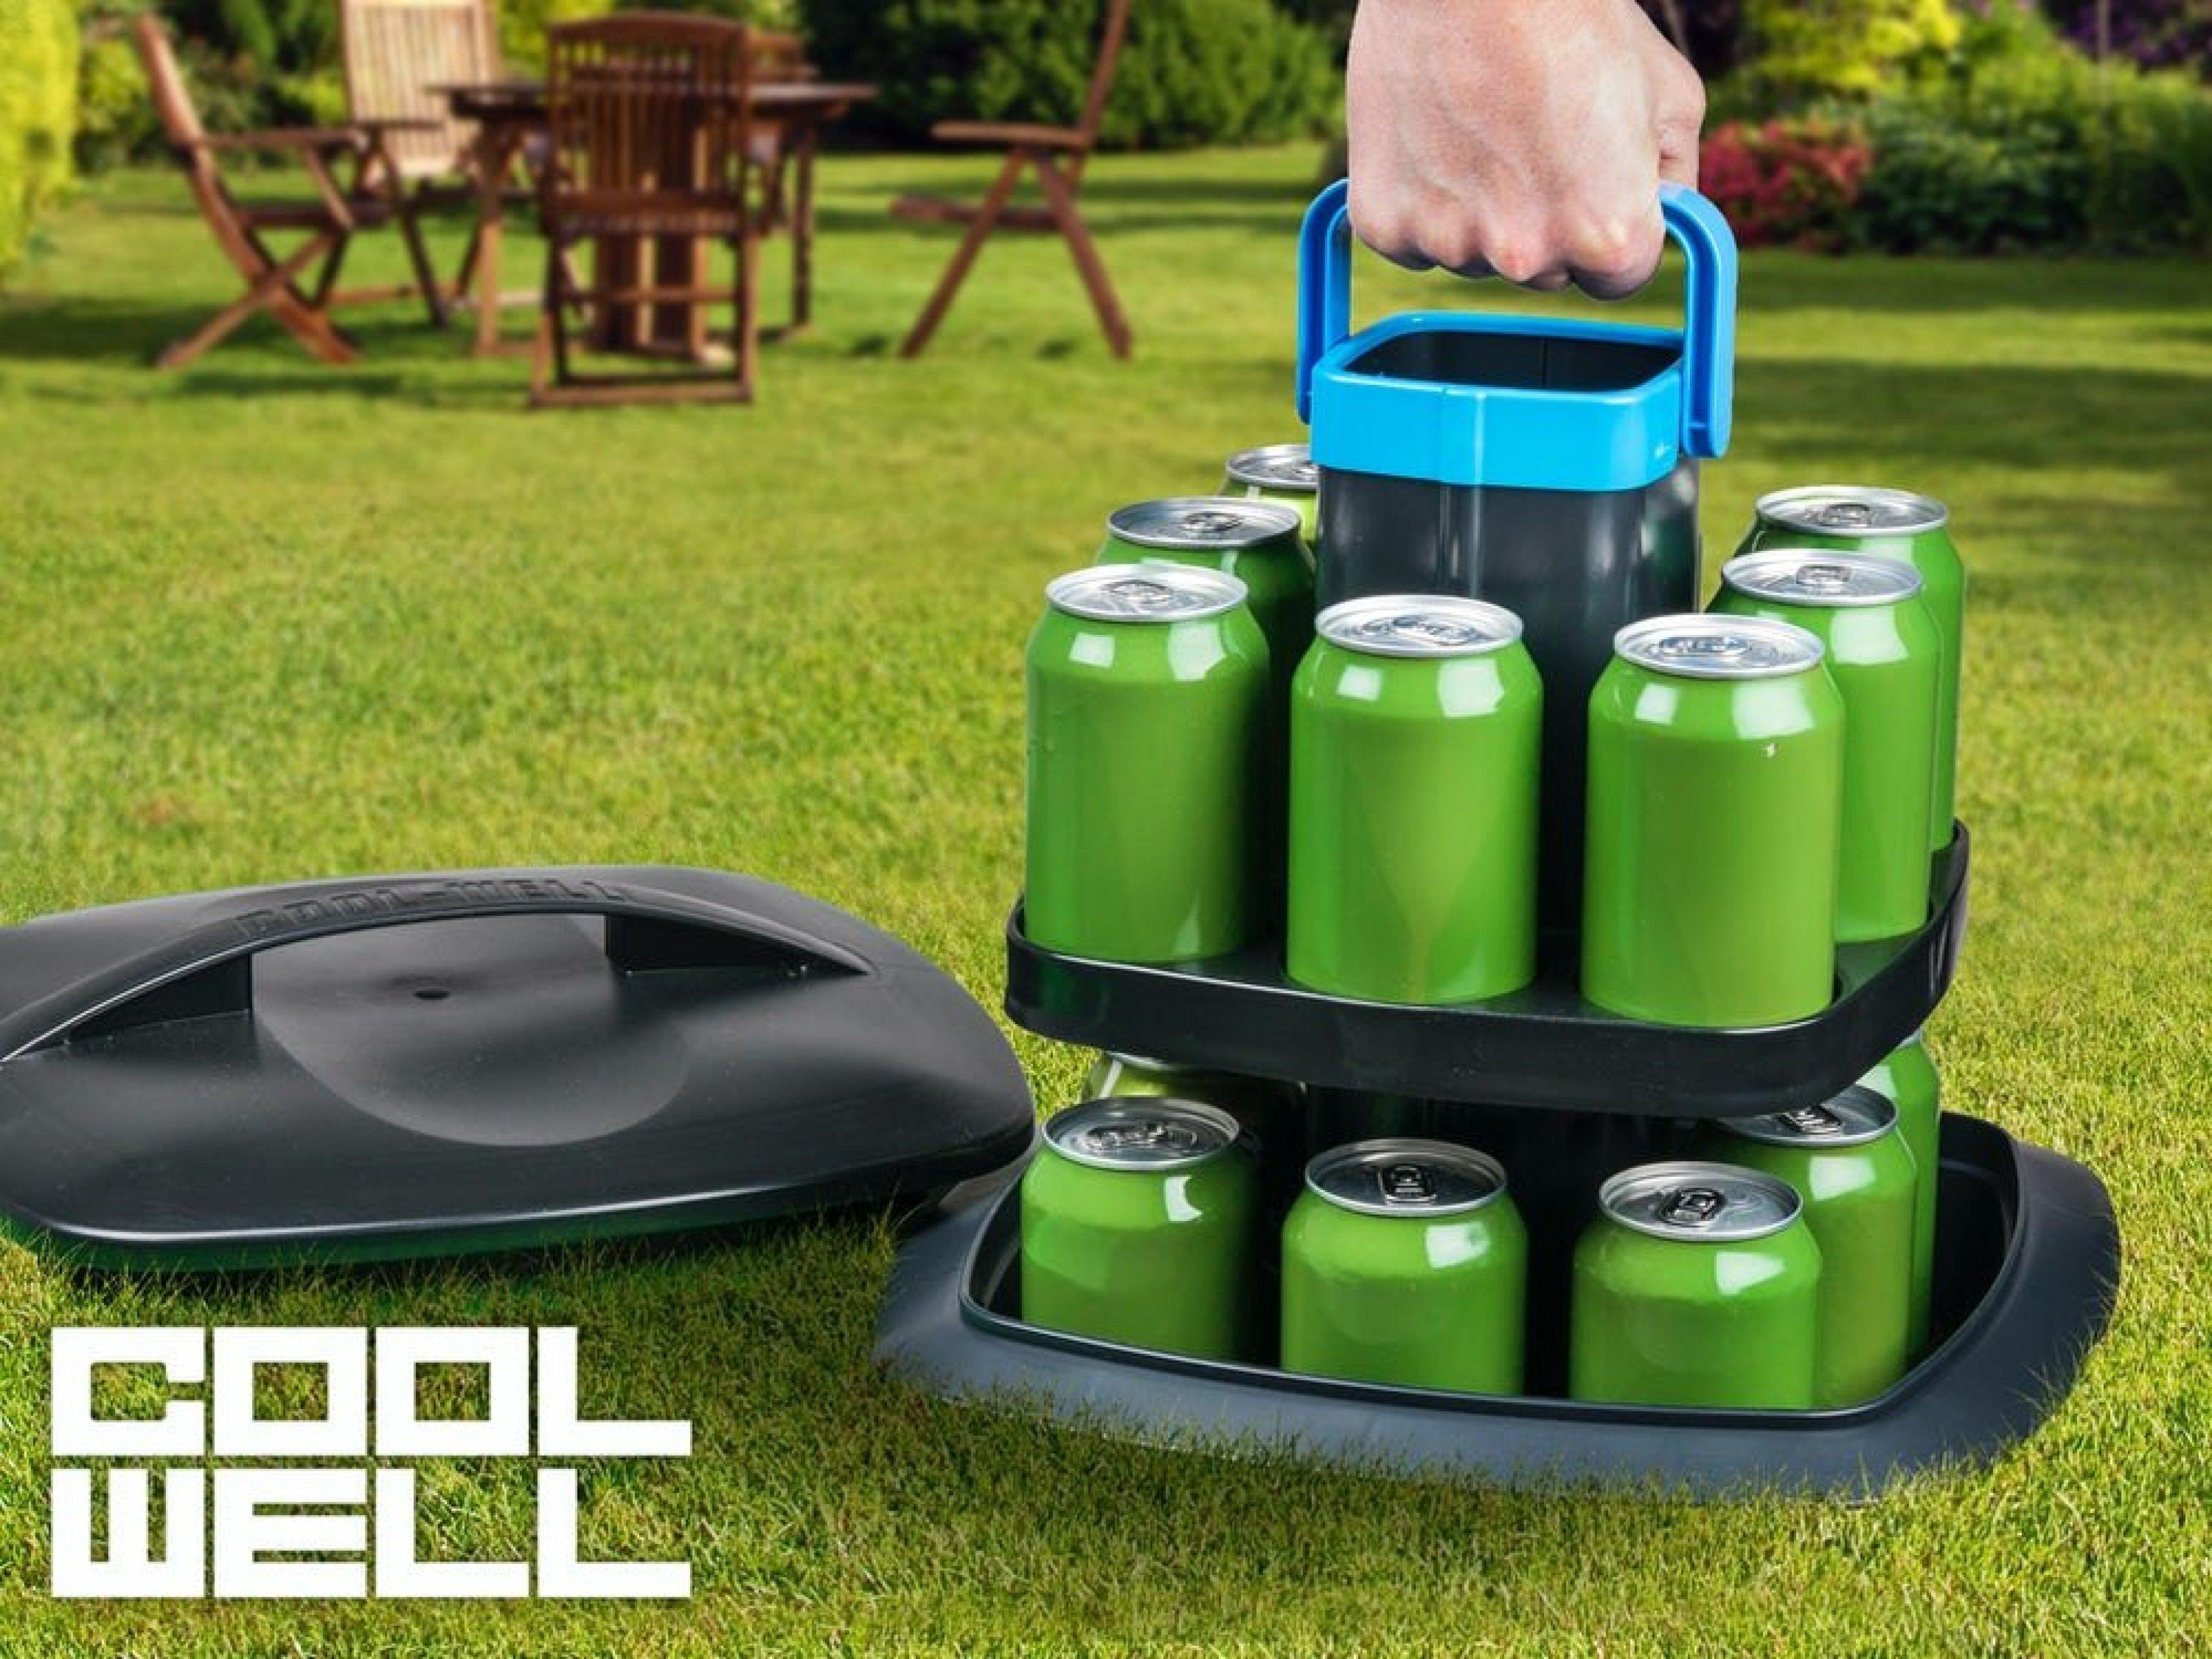 Cool Well Ølbrønd: Den perfekte gadget til en grillaften